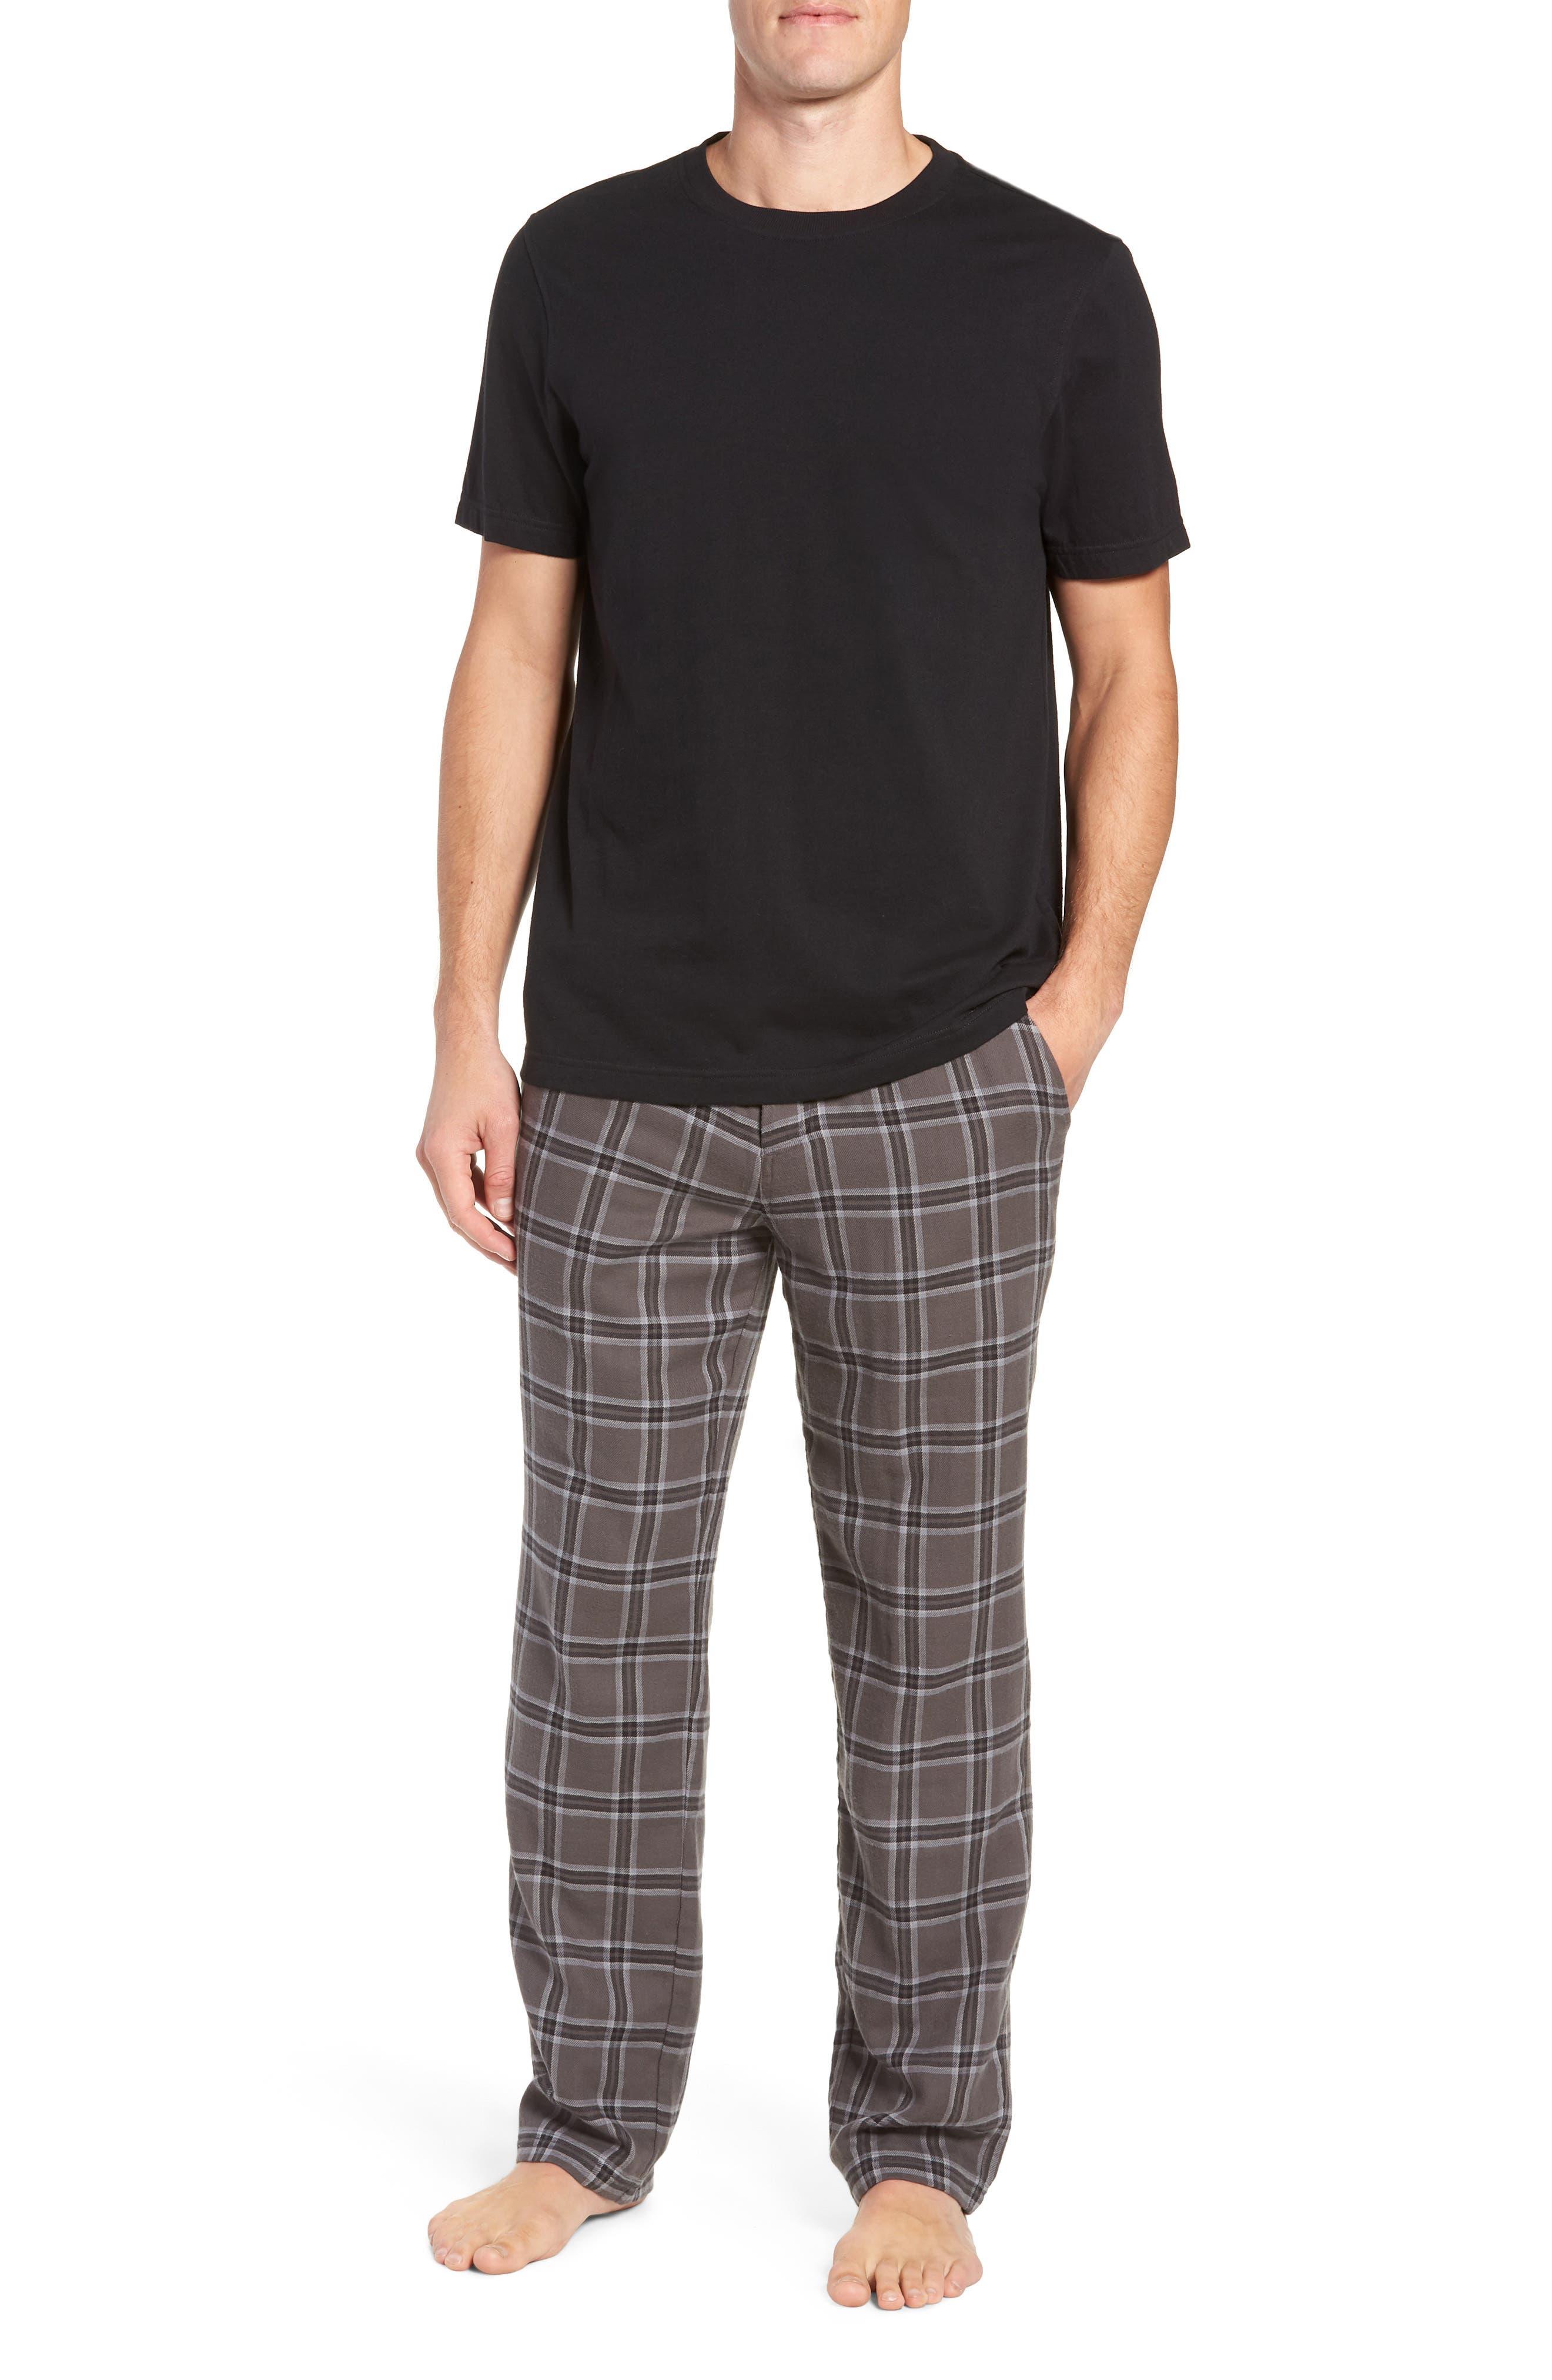 Grant Pajama Set,                         Main,                         color, CHARCOAL/ BLACK